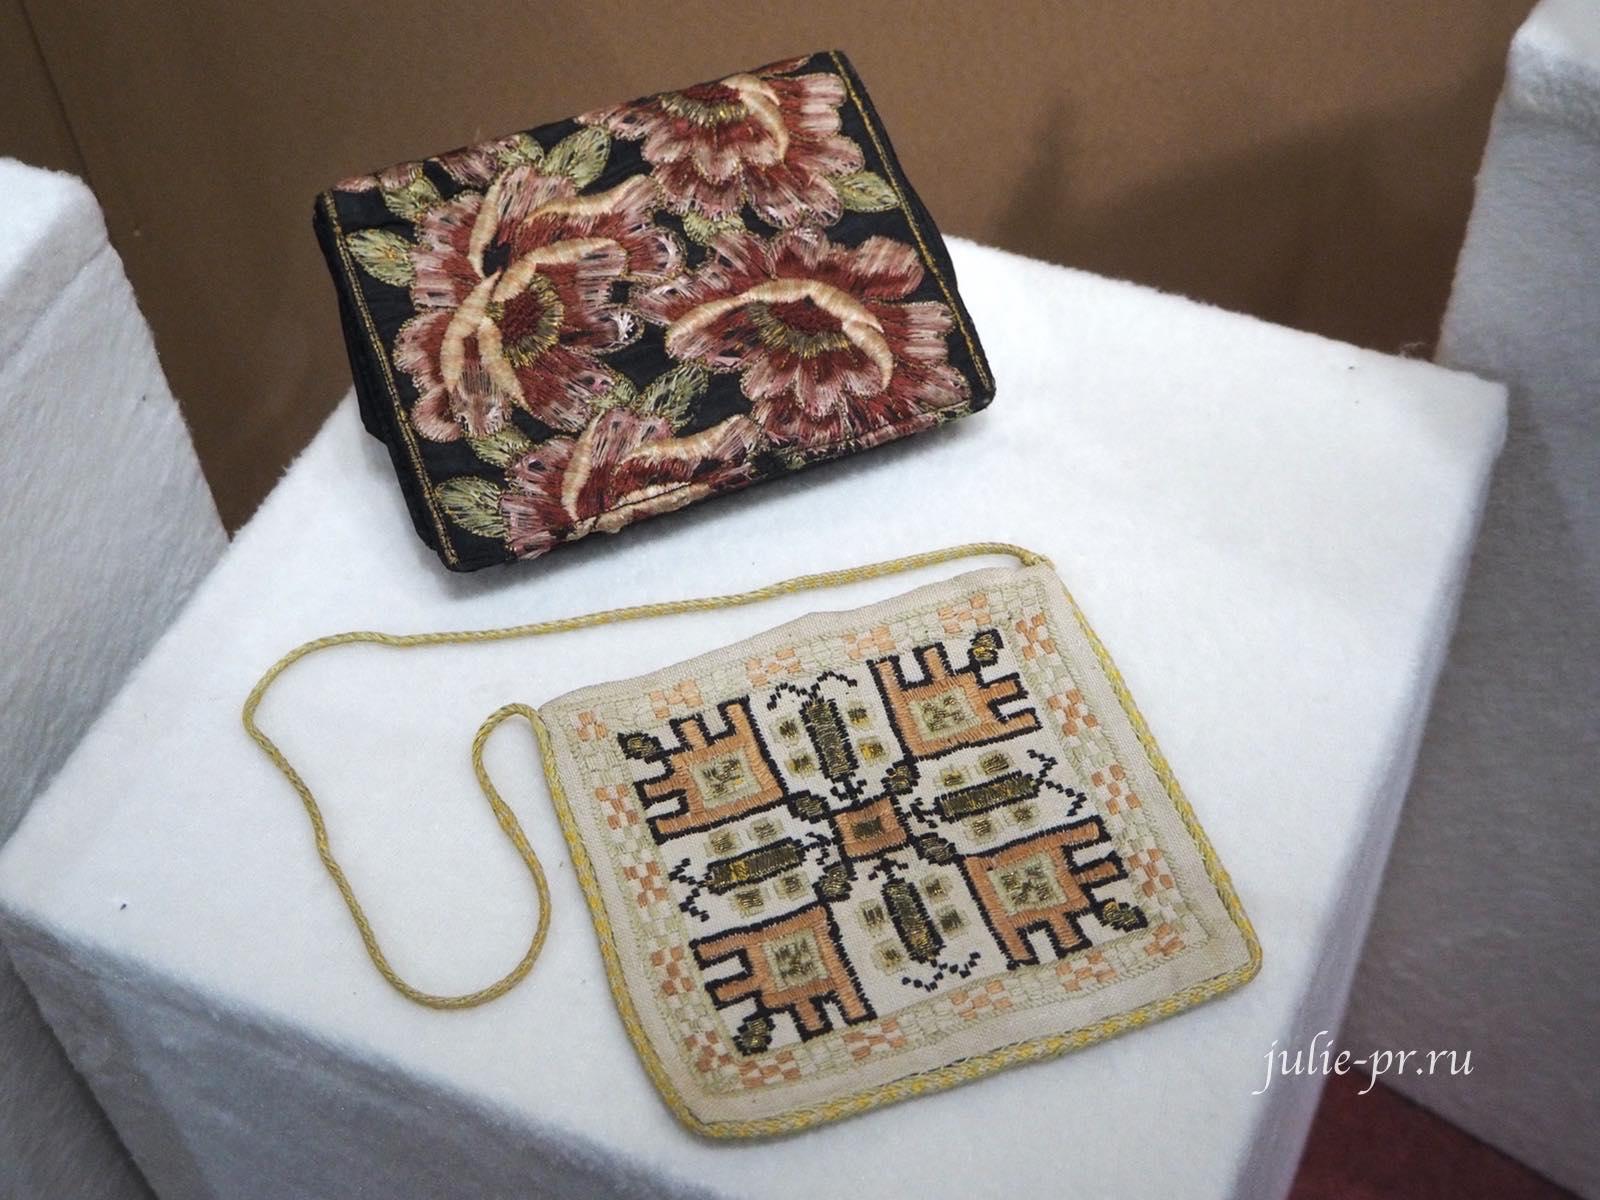 Сумочки (Россия, XX век): вышивка